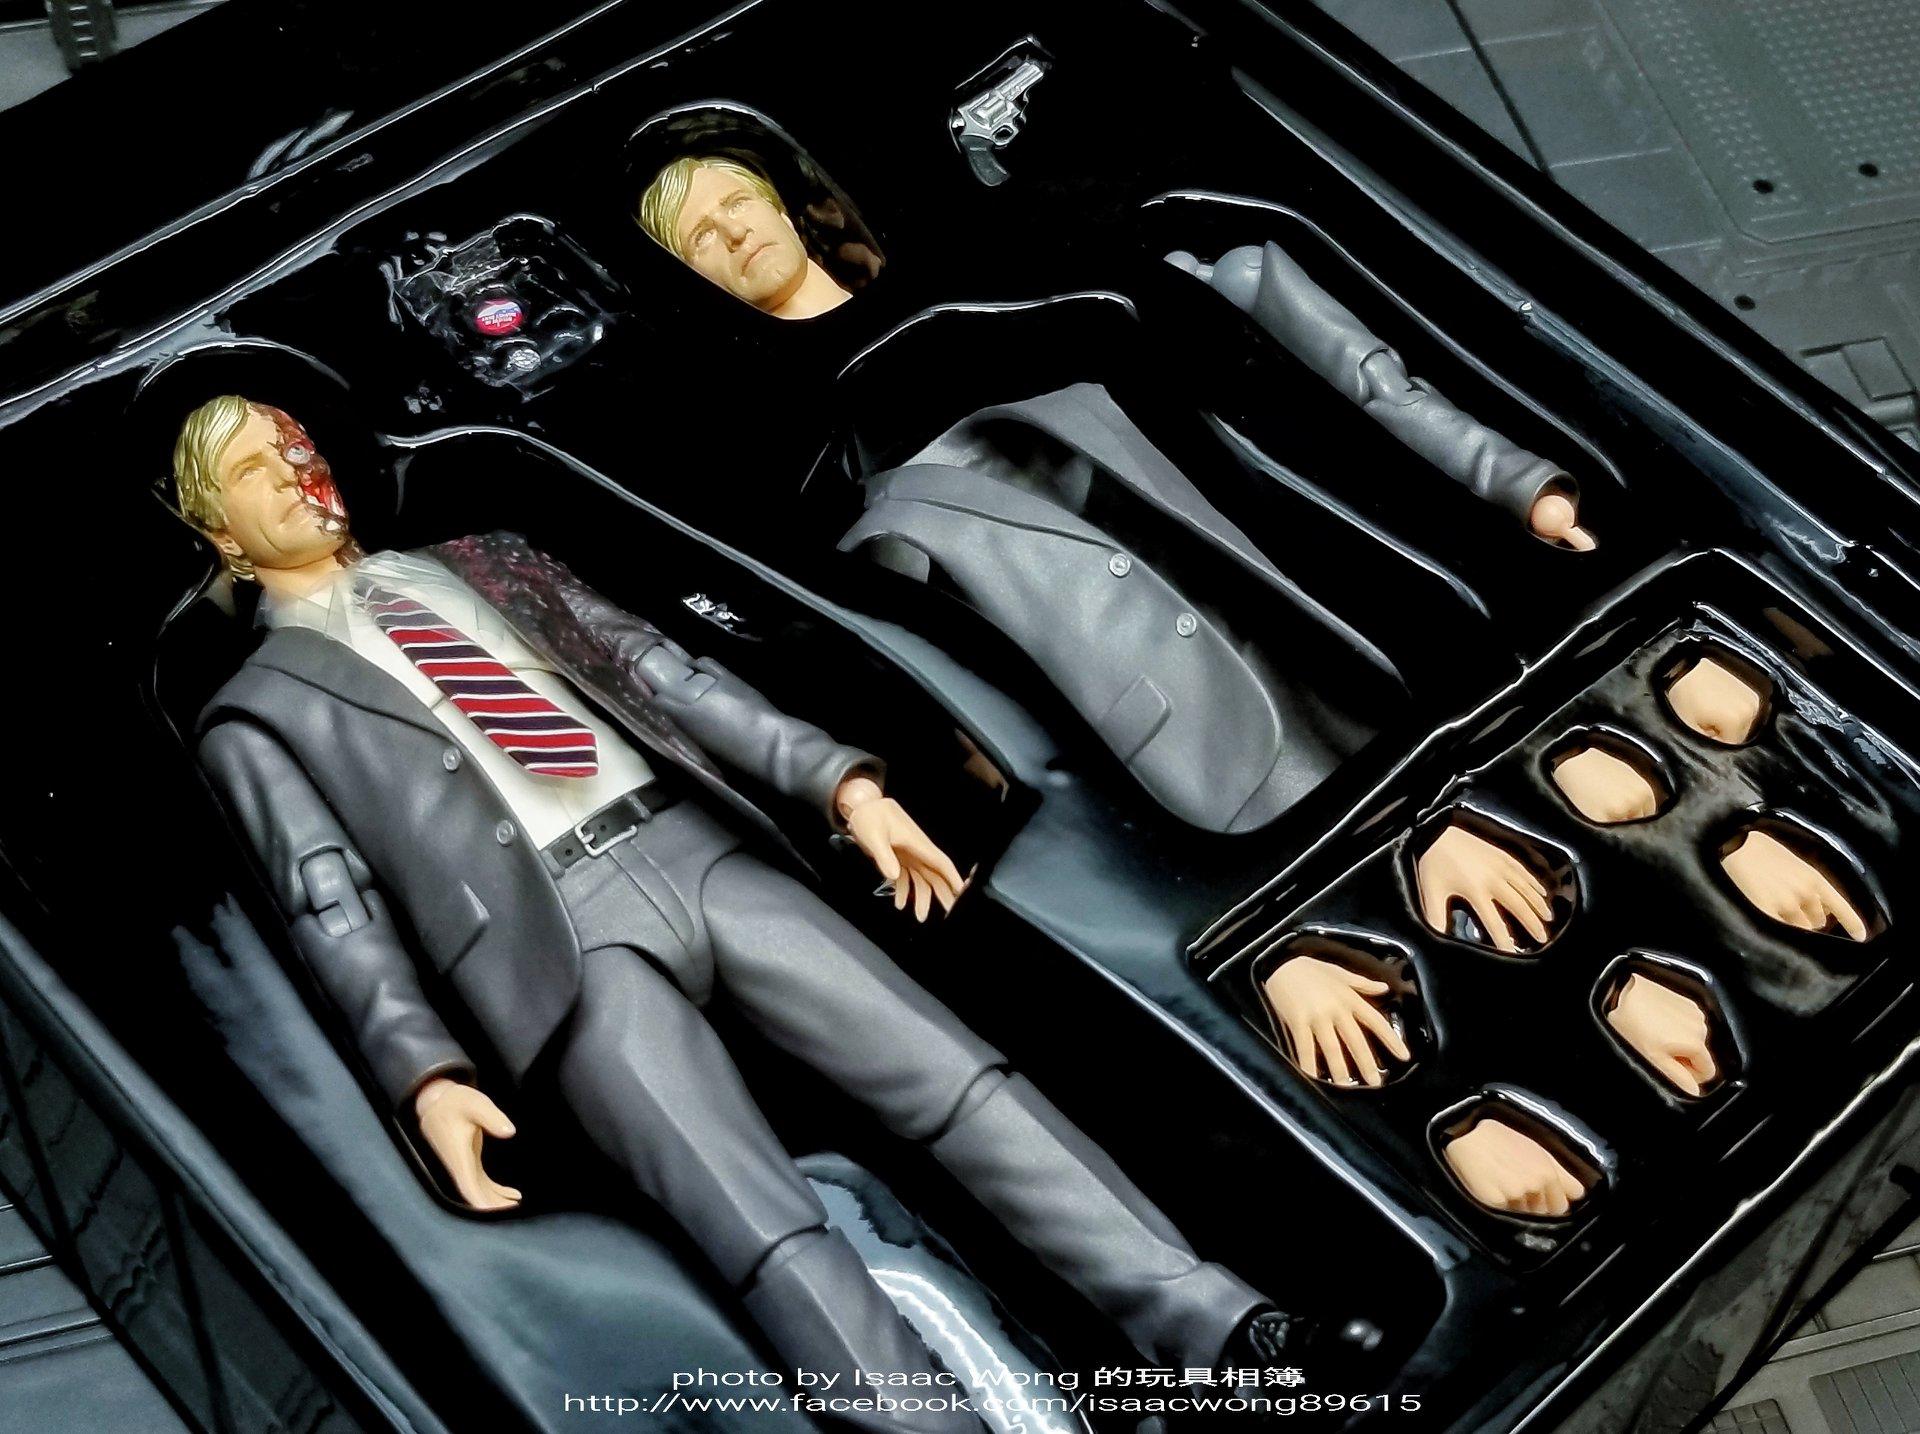 Batman The Dark Knight : Harvey Dent Mafex (Medicom Toys) AOhmQjPt_o